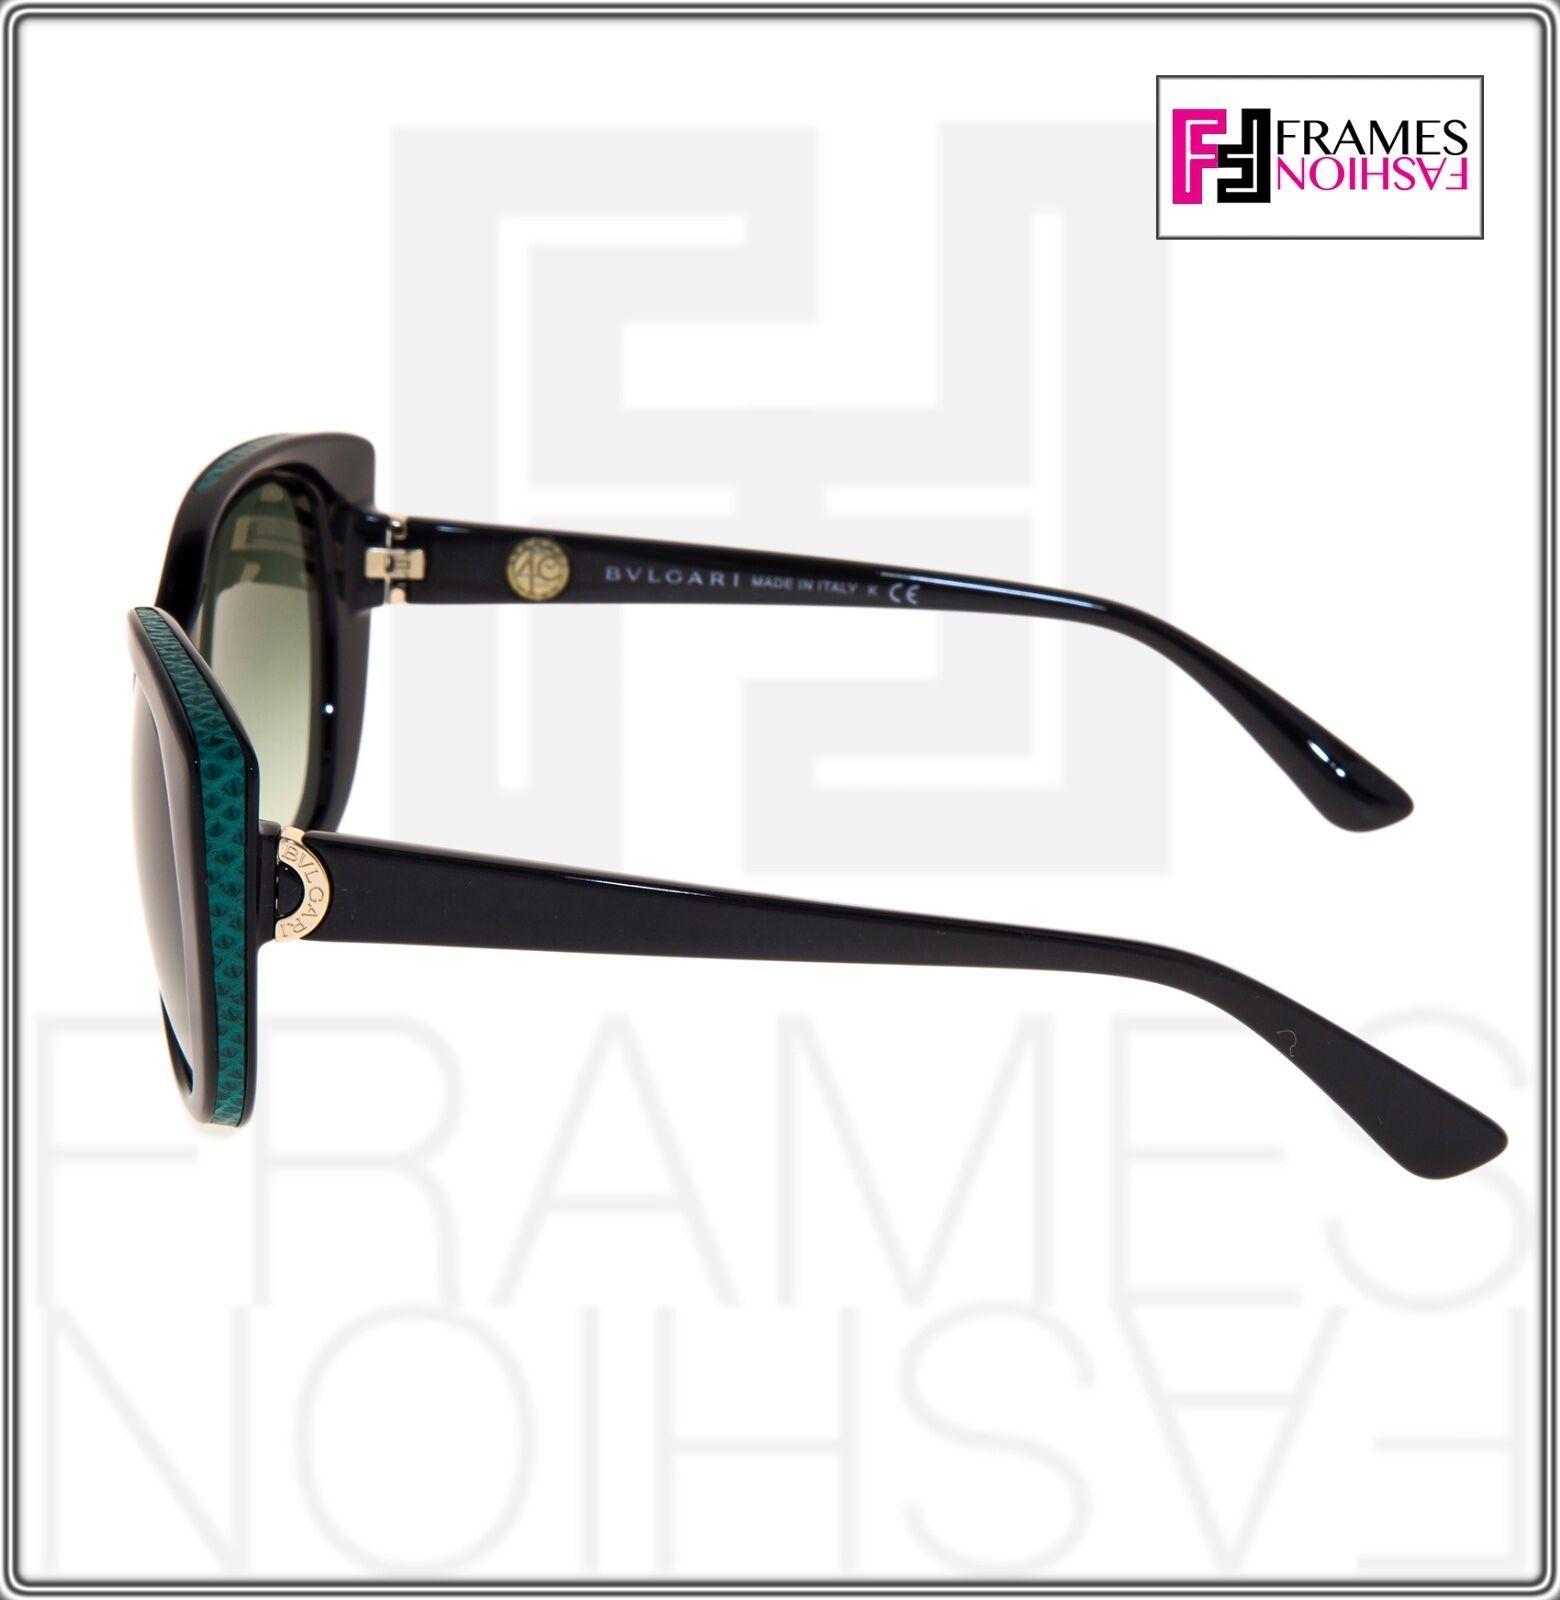 BVLGARI LOGO BV8169Q Black Green Leather Gradient Cat Eye Sunglasses Gold 8169 image 2